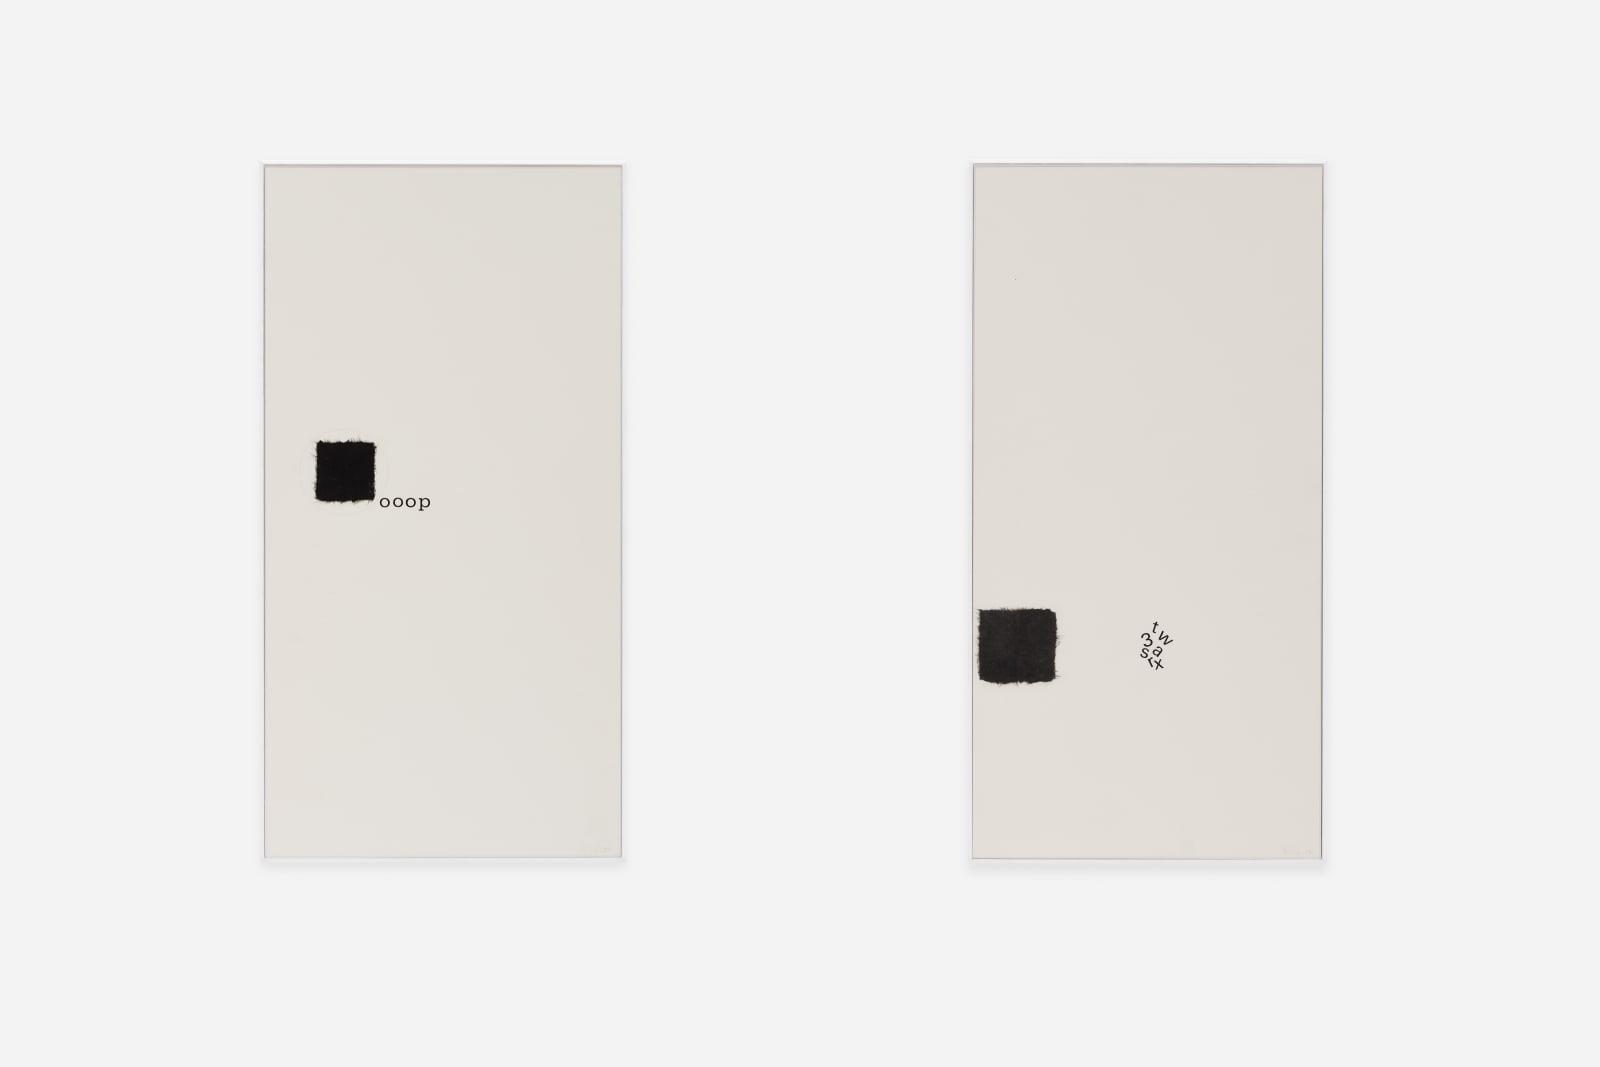 Installation view Mira Schendel: Six drawings - Monotipias, Toquinhos. Cecilia Brunson Projects, London. (26 February - 30 April 2021) Photography by Eva Herzog